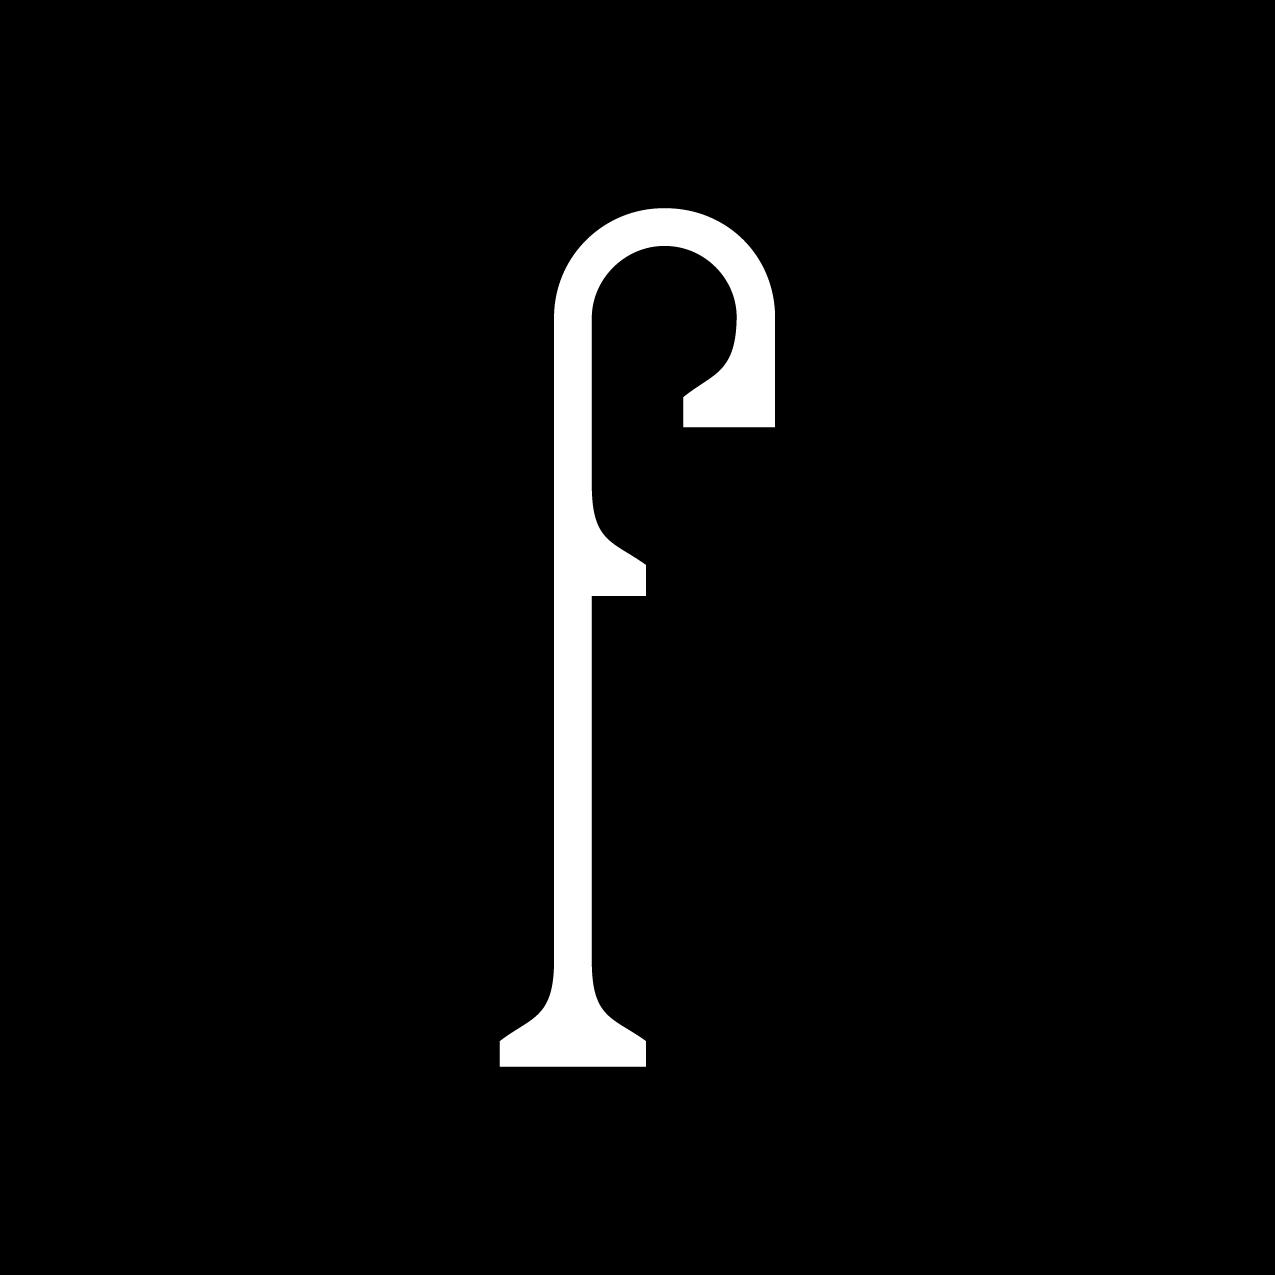 Letter F6 design by Furia